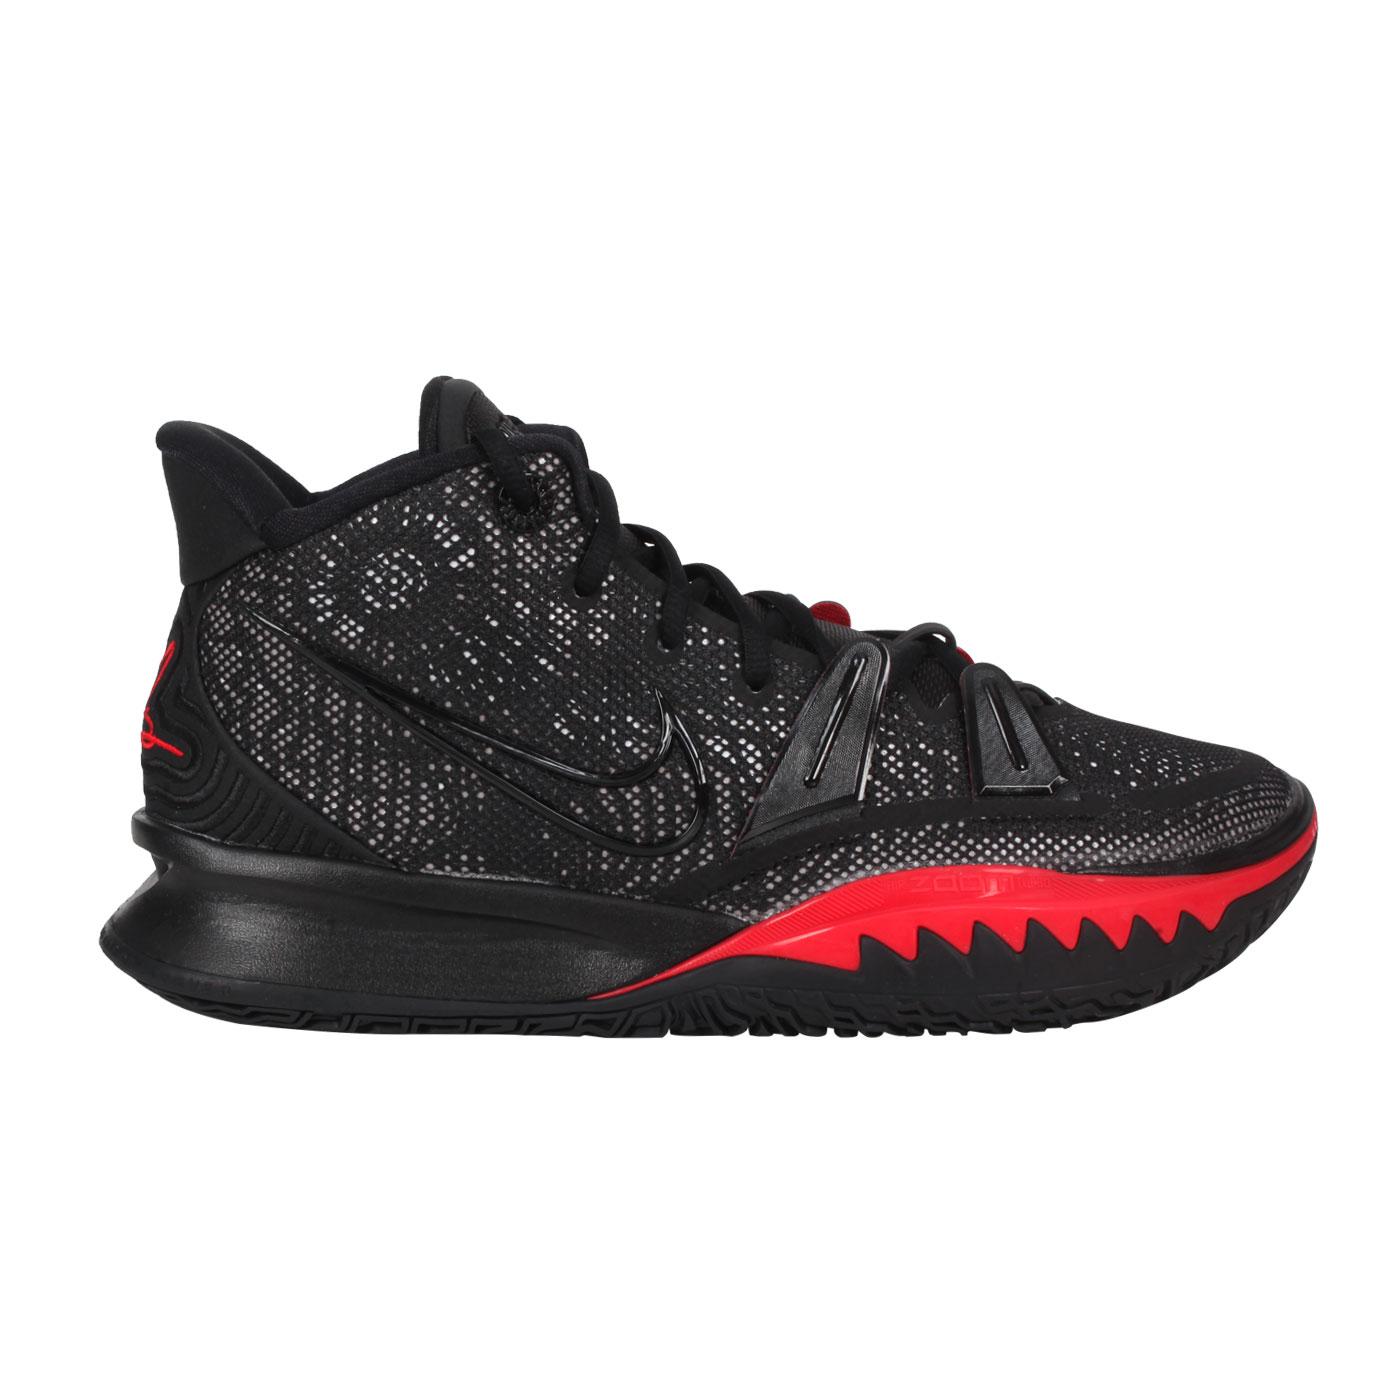 NIKE 男款籃球鞋  @KYRIE 7 EP@CQ9327001 - 黑紅